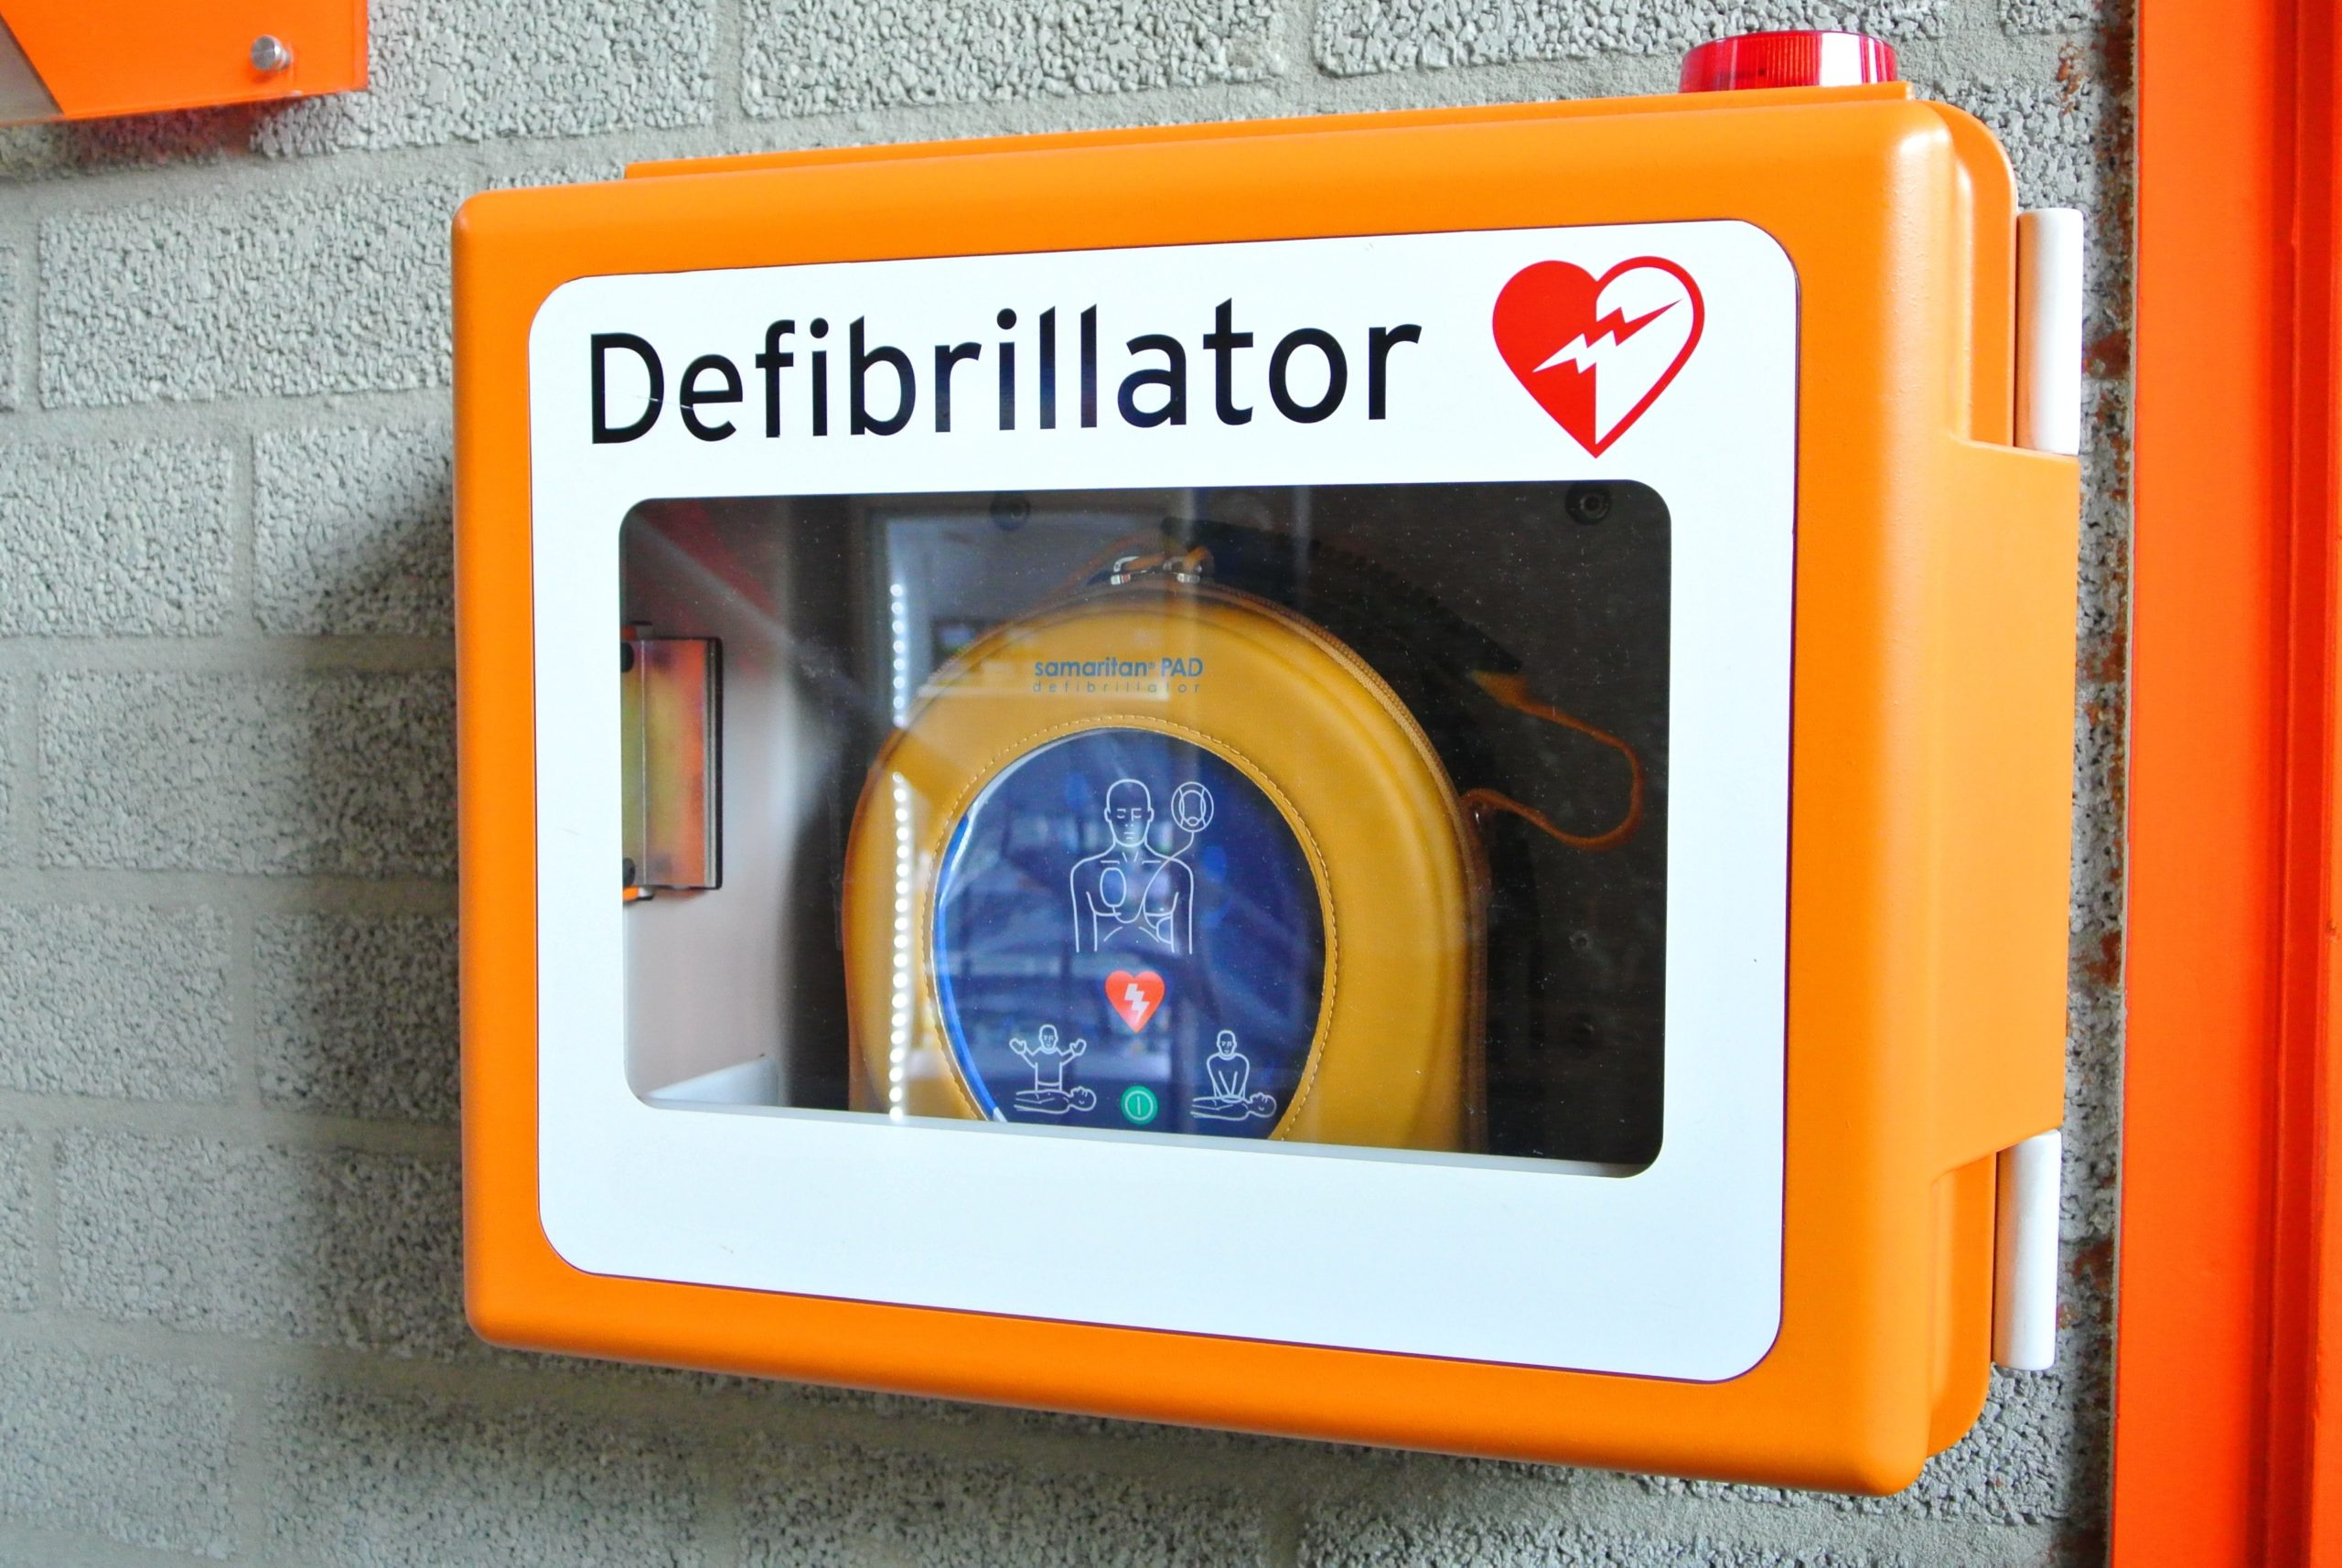 Defibrillator in a box